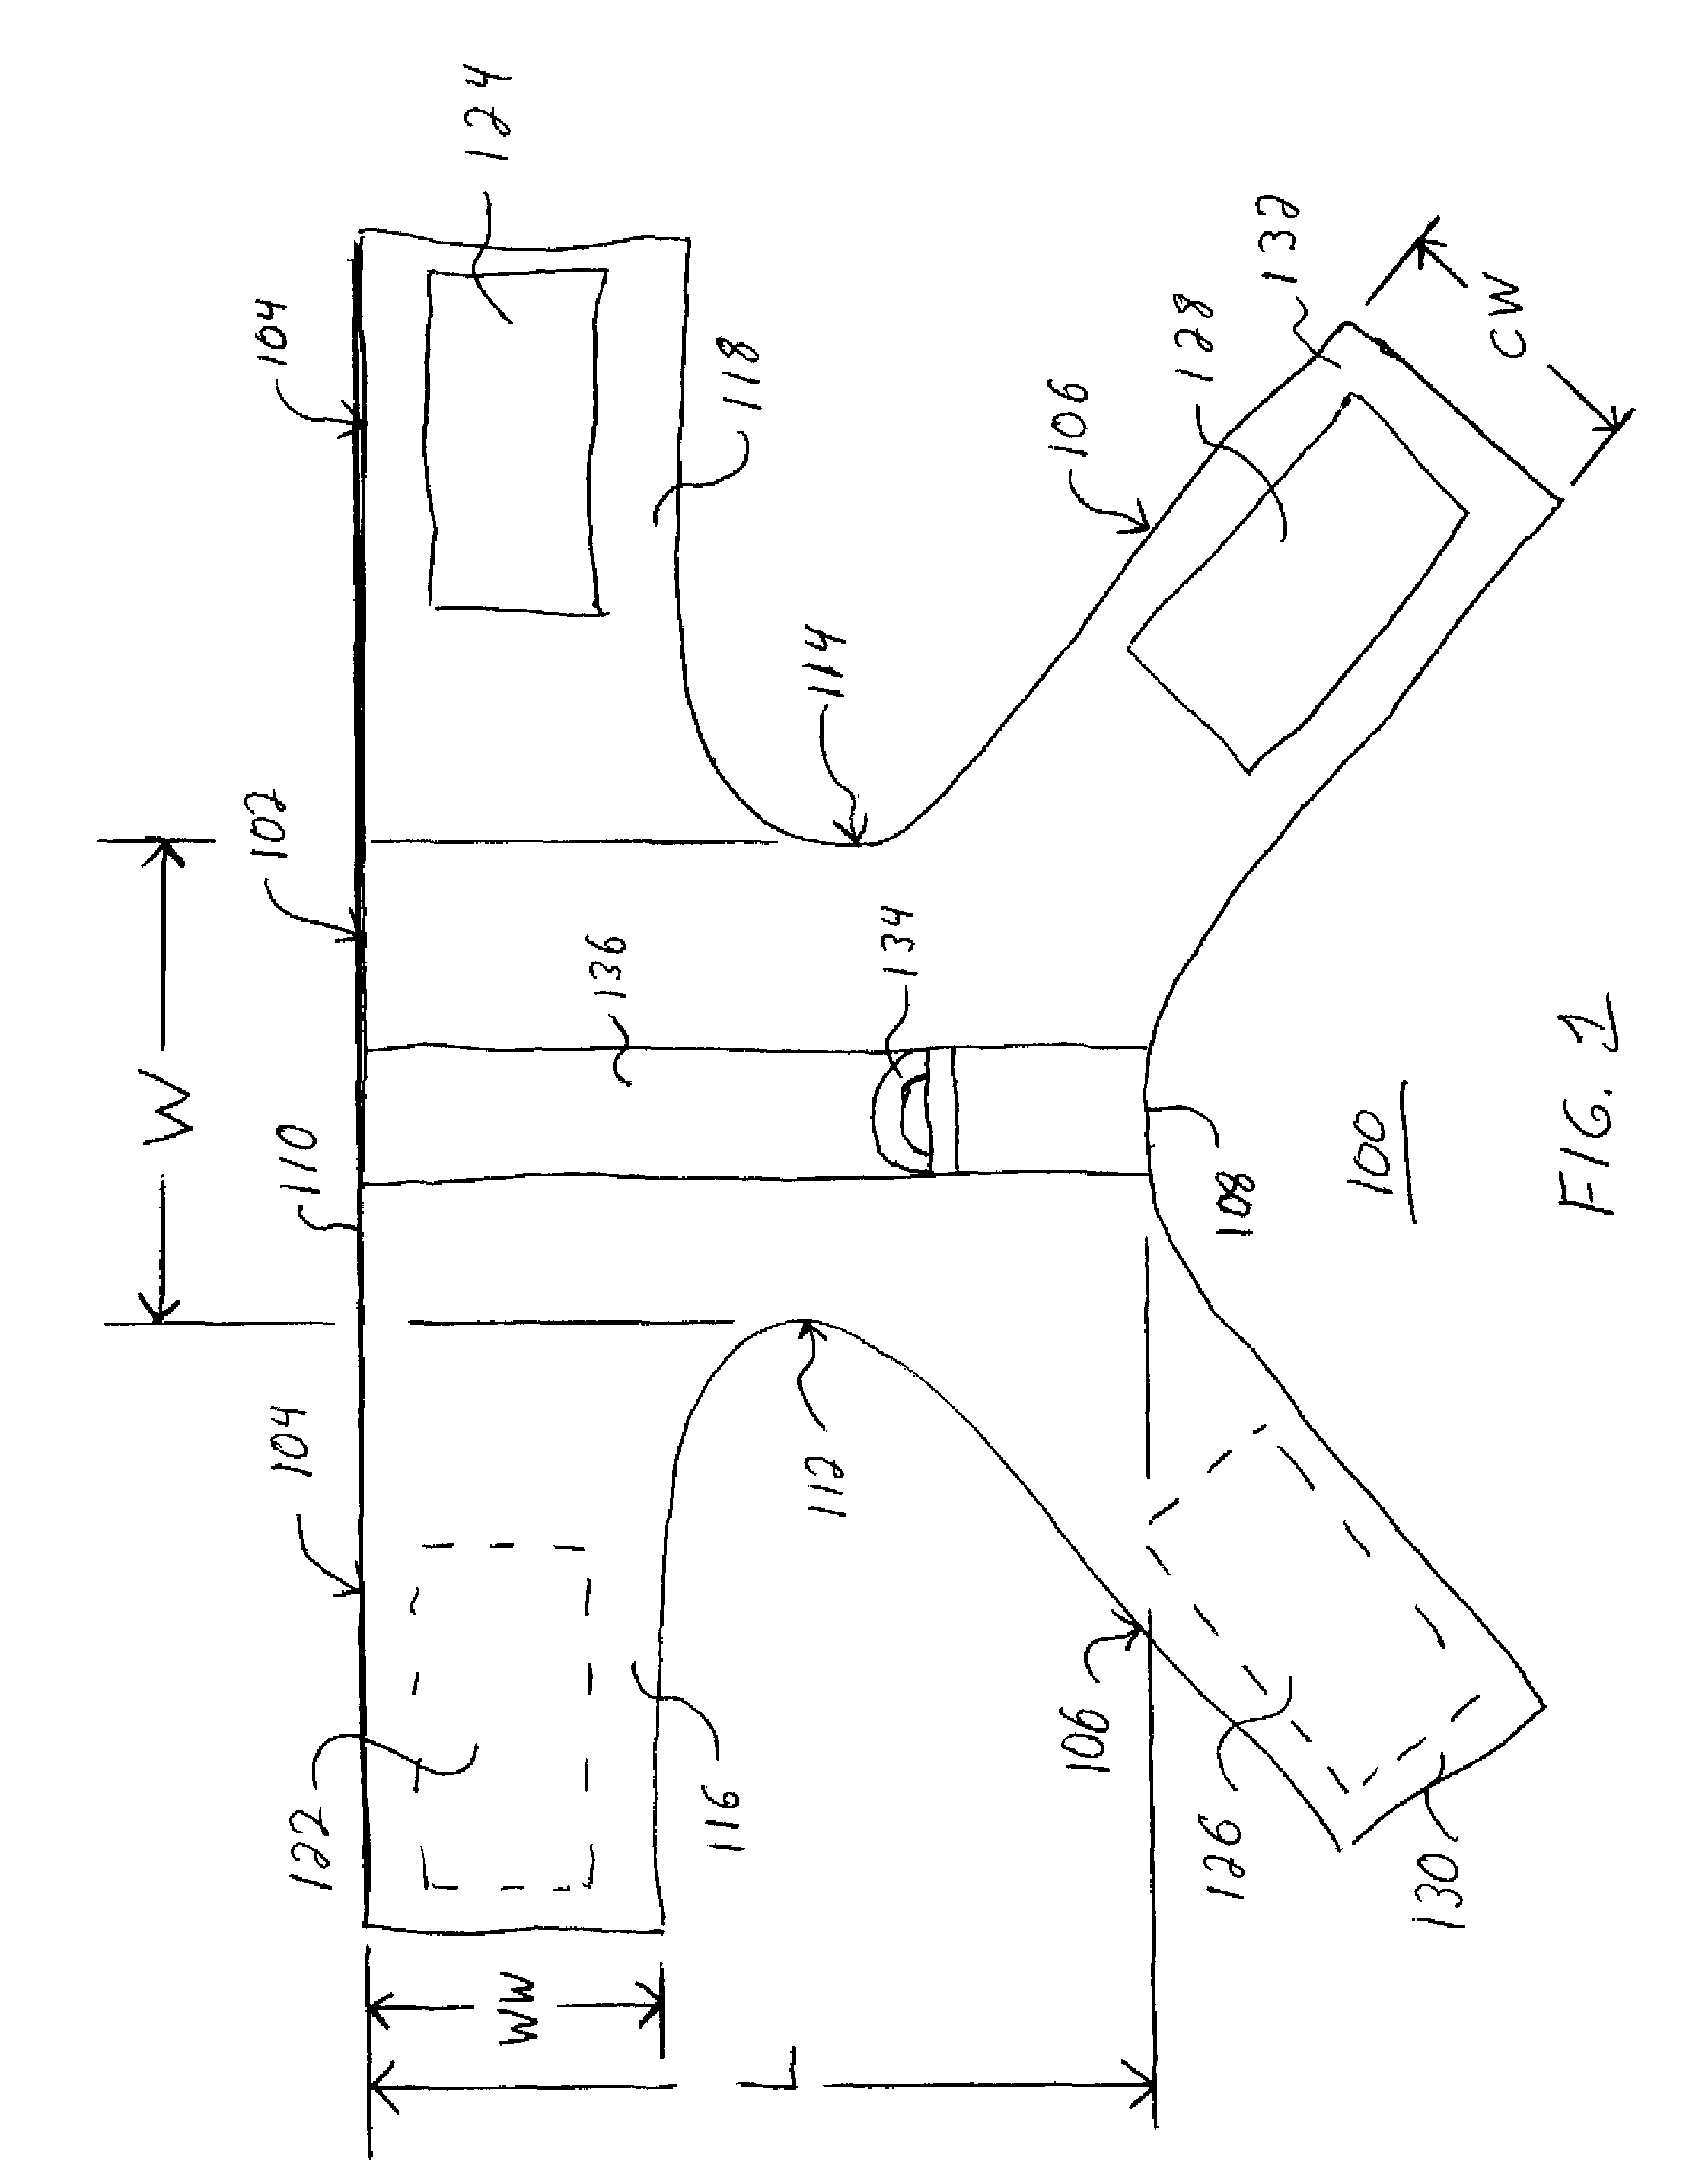 patent us8132544 - cat harness